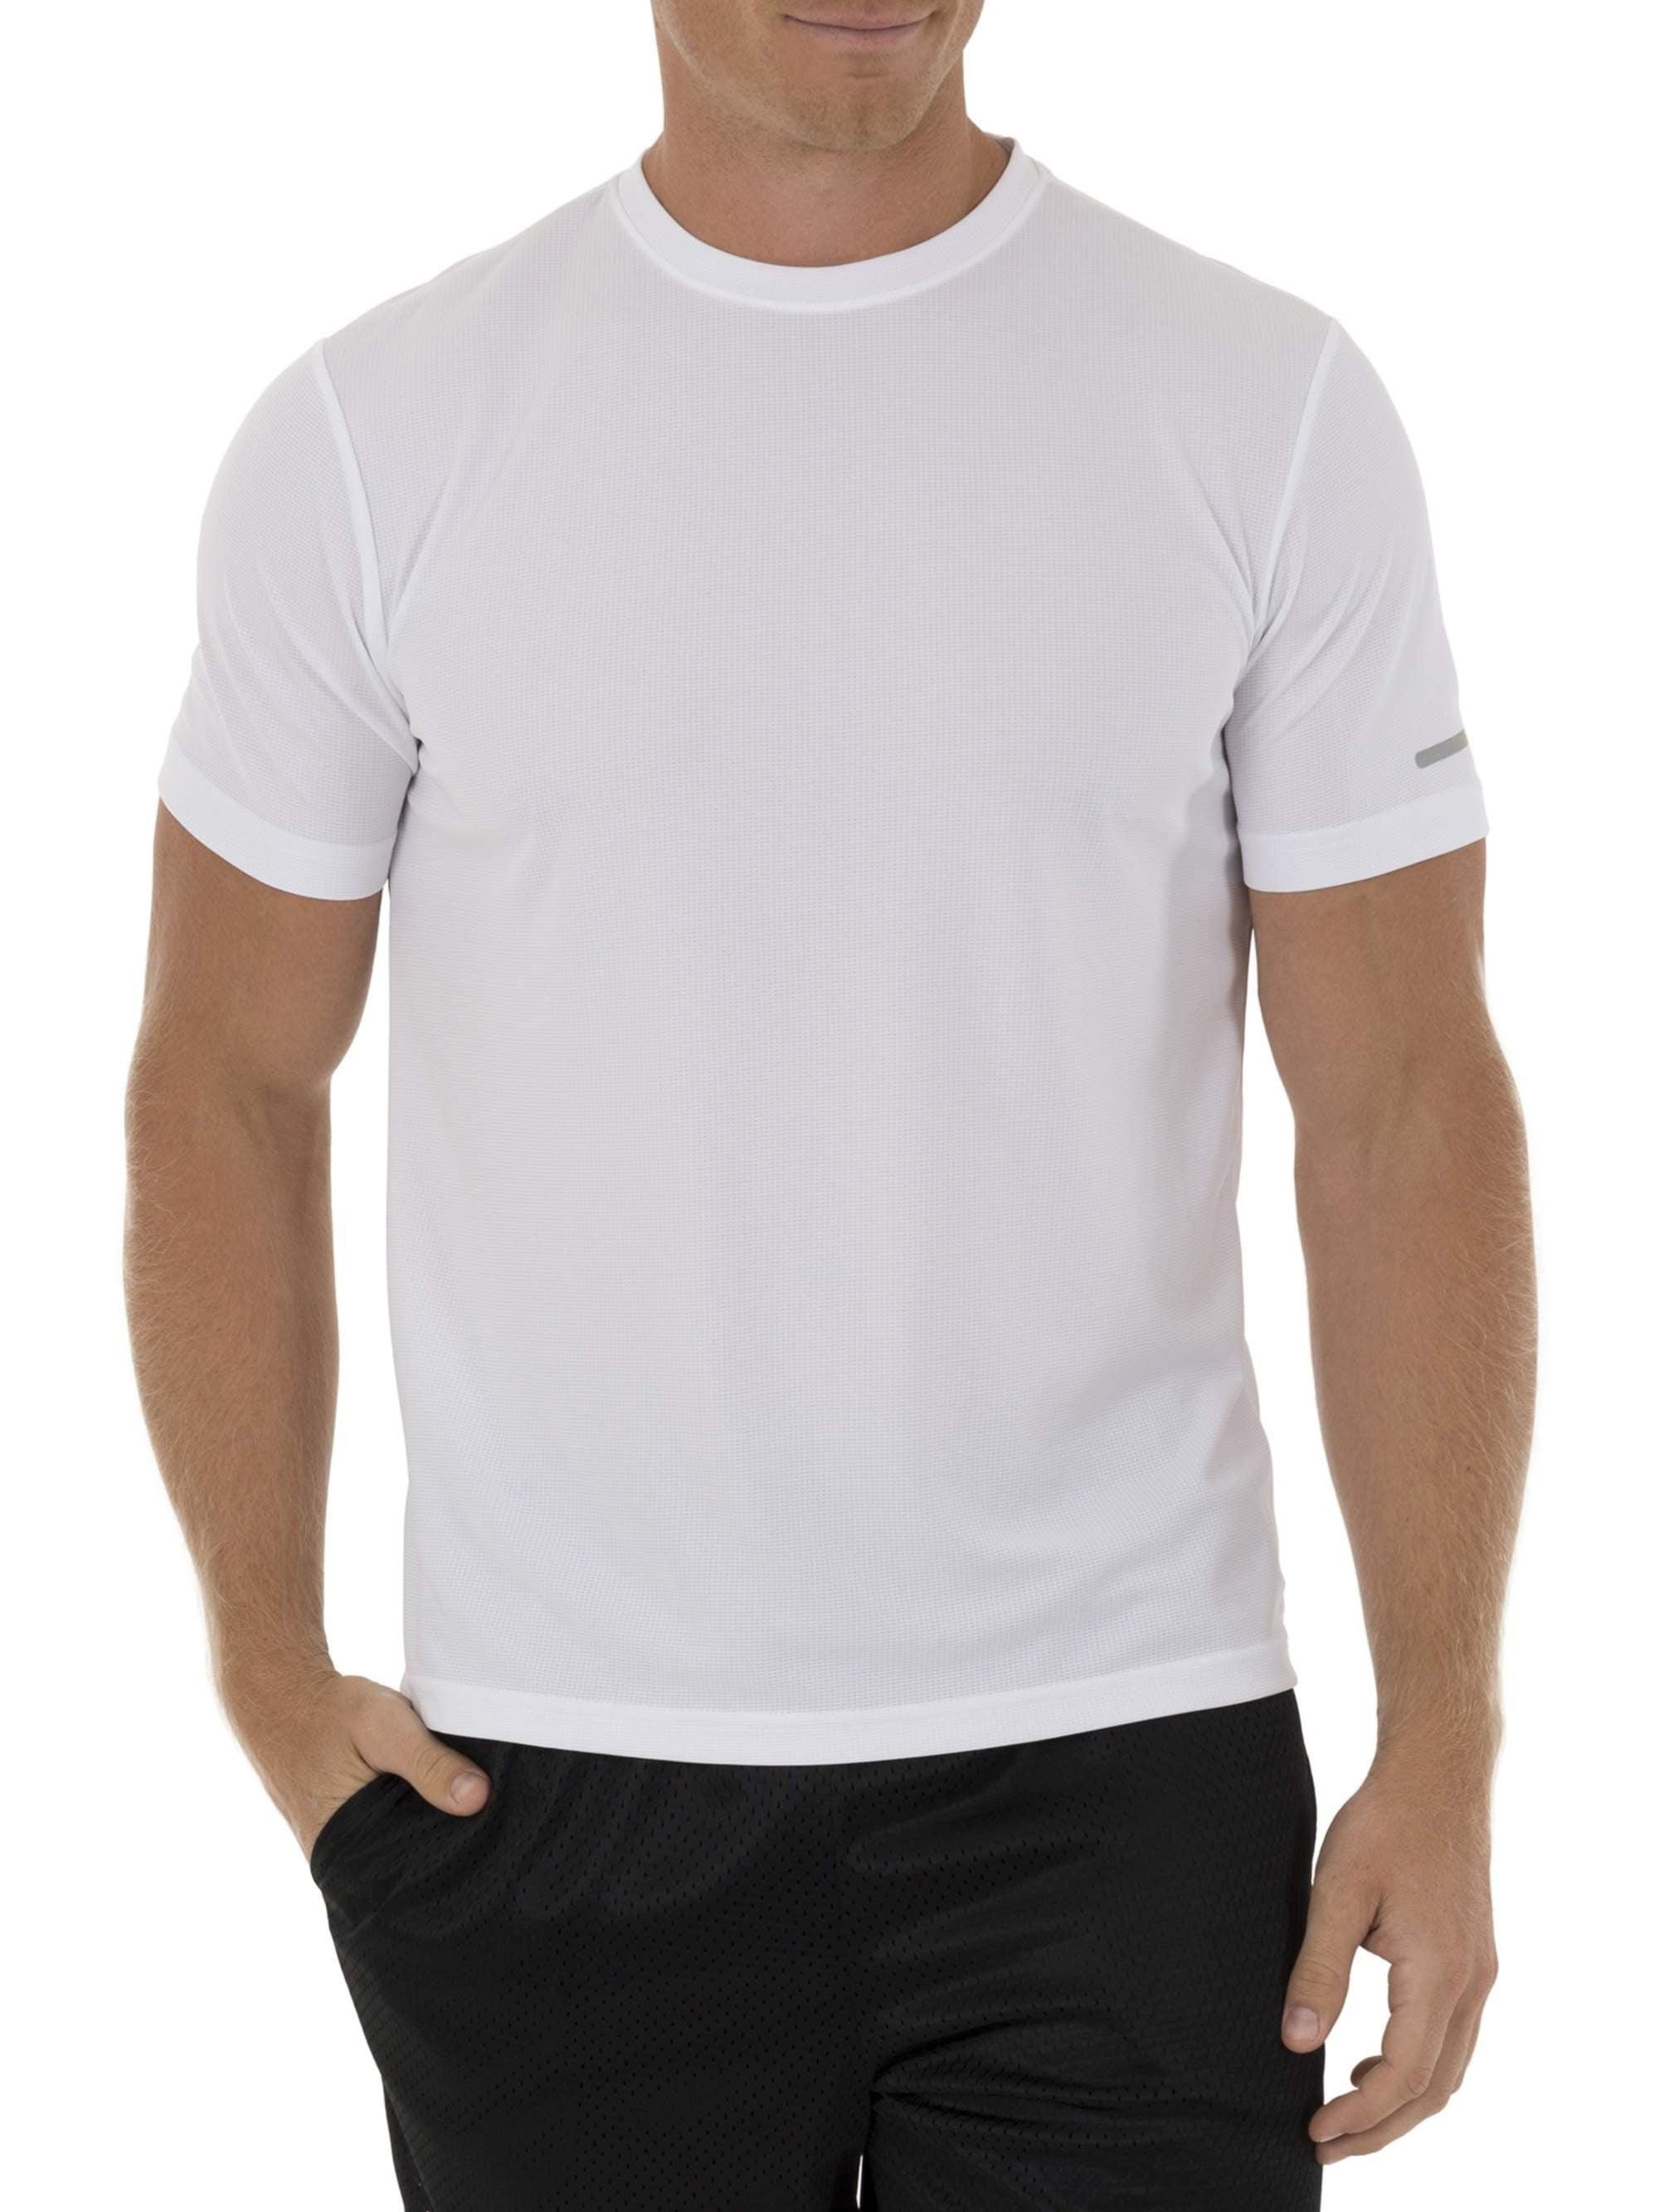 Artic Animals Mens Sport Mesh T-Shirt 4XL